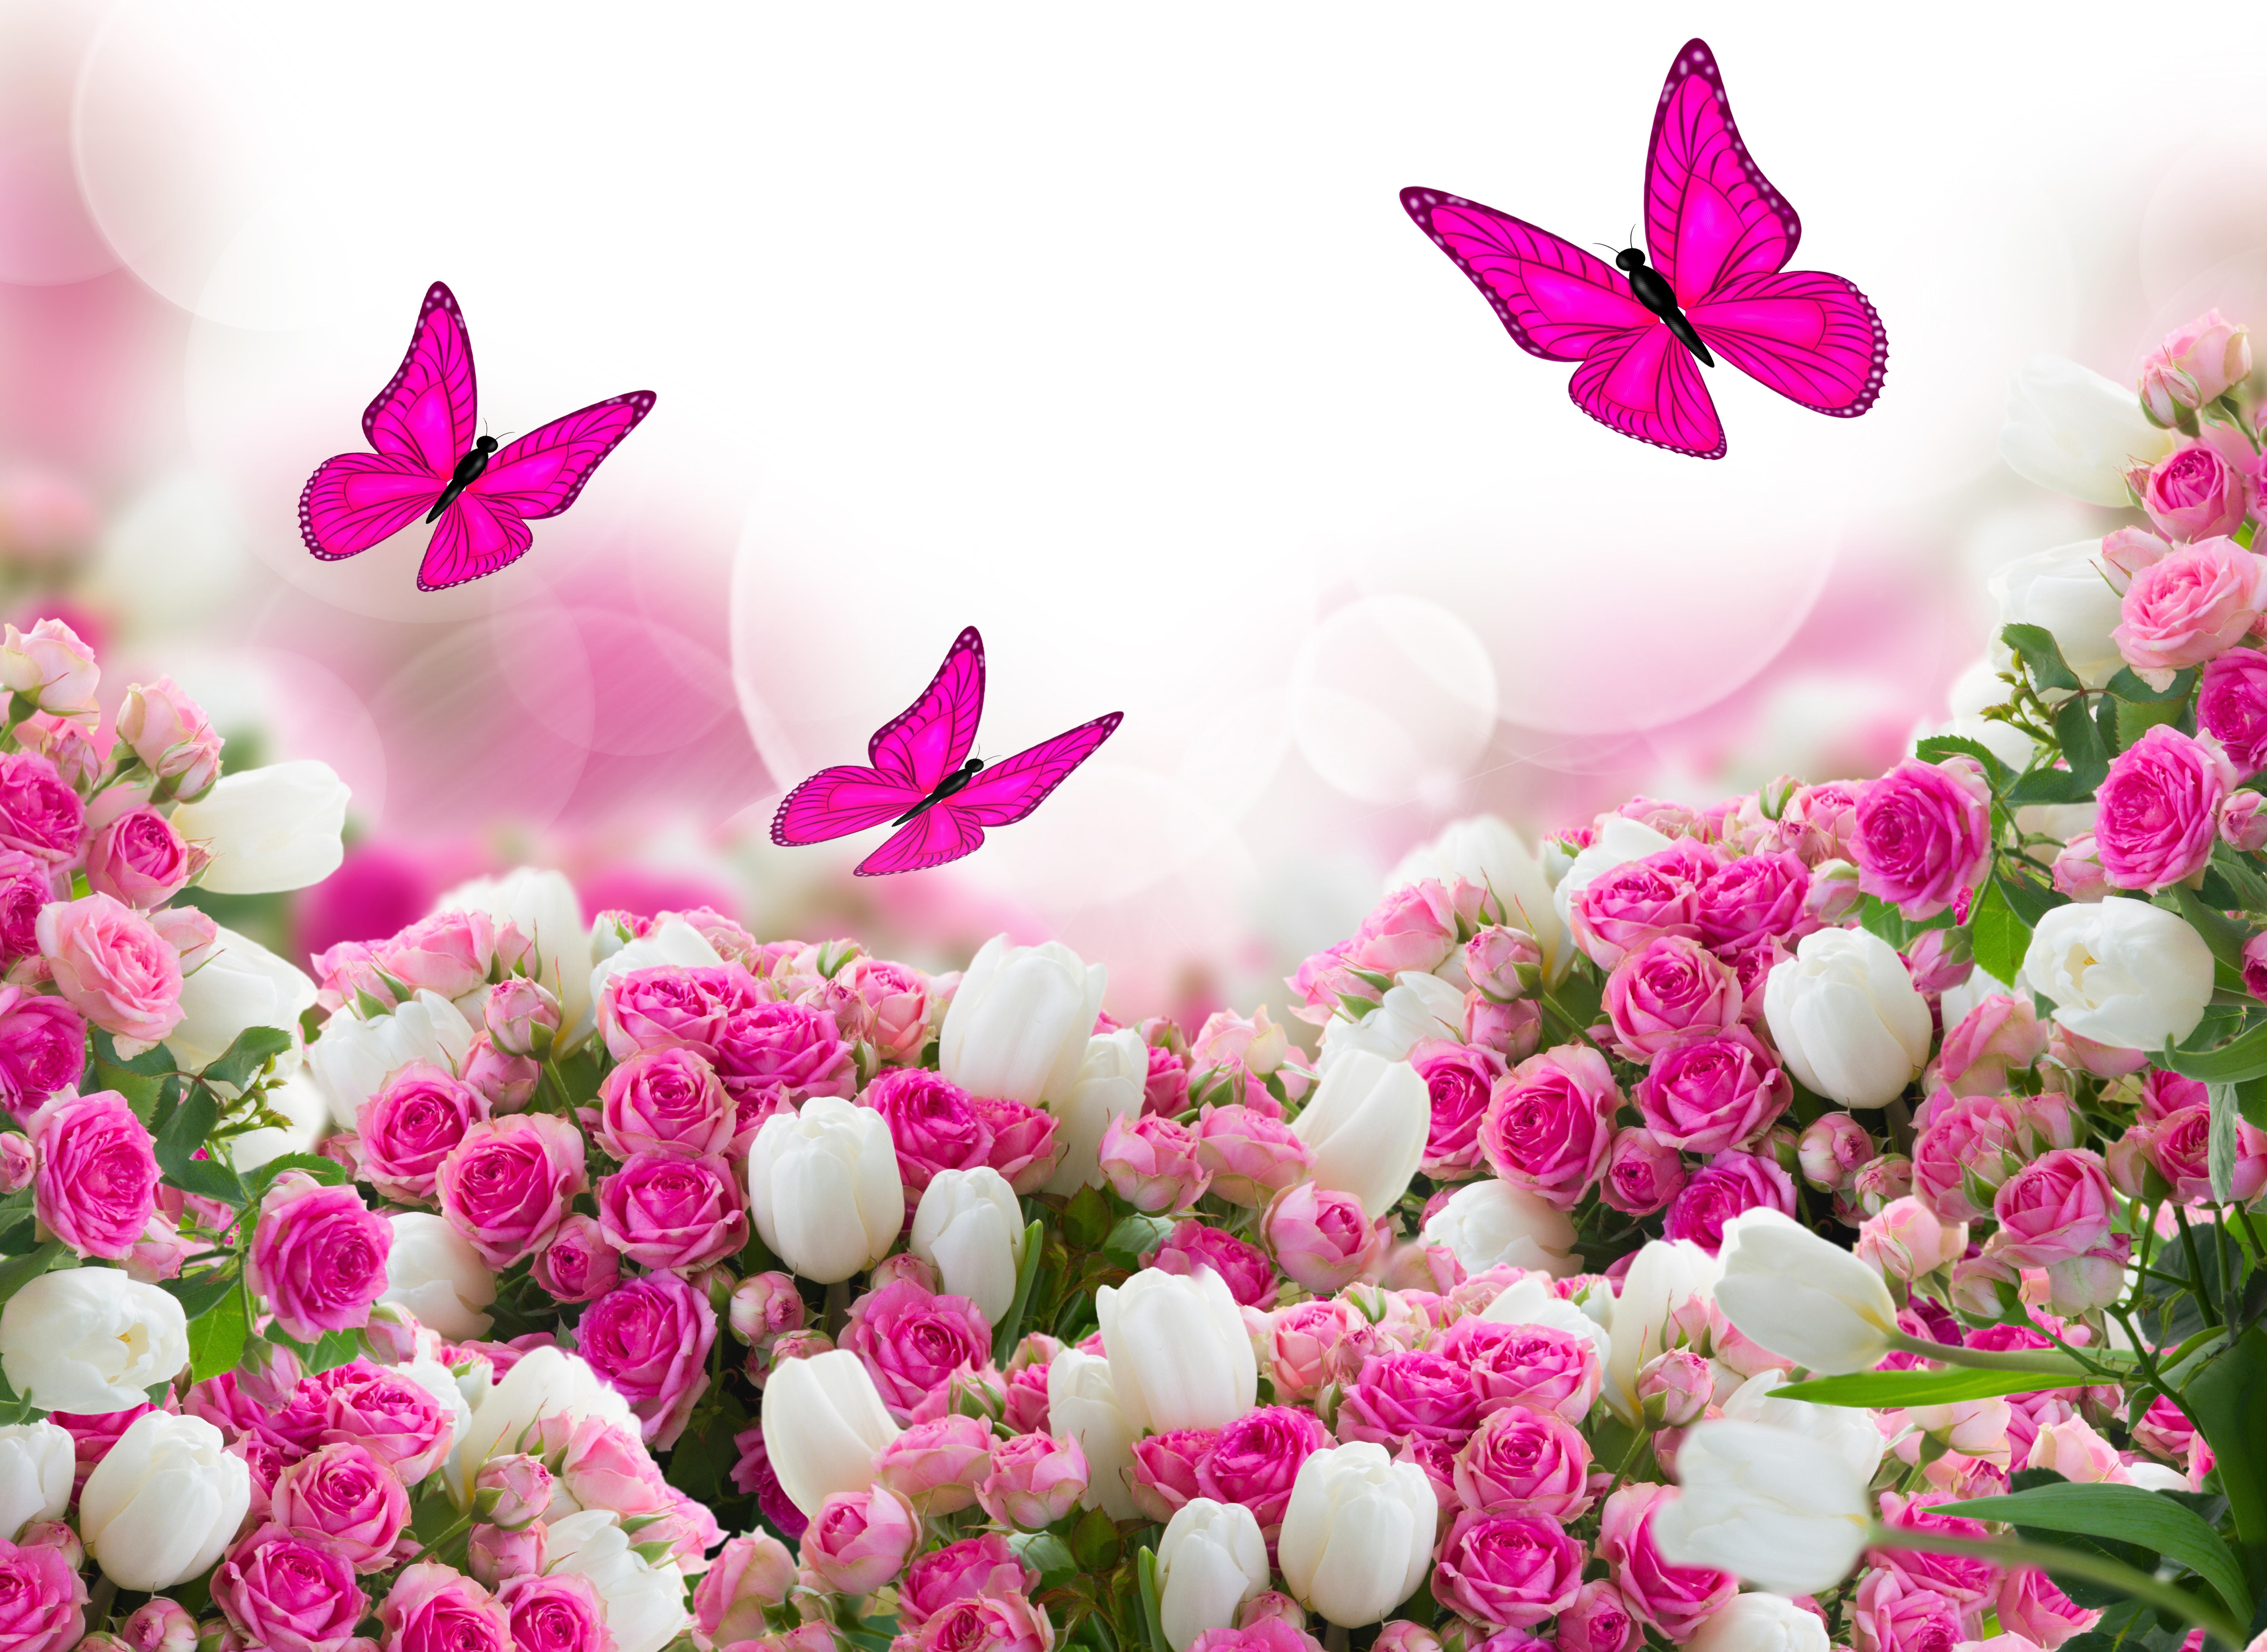 Цветы бабочки обои на рабочий стол